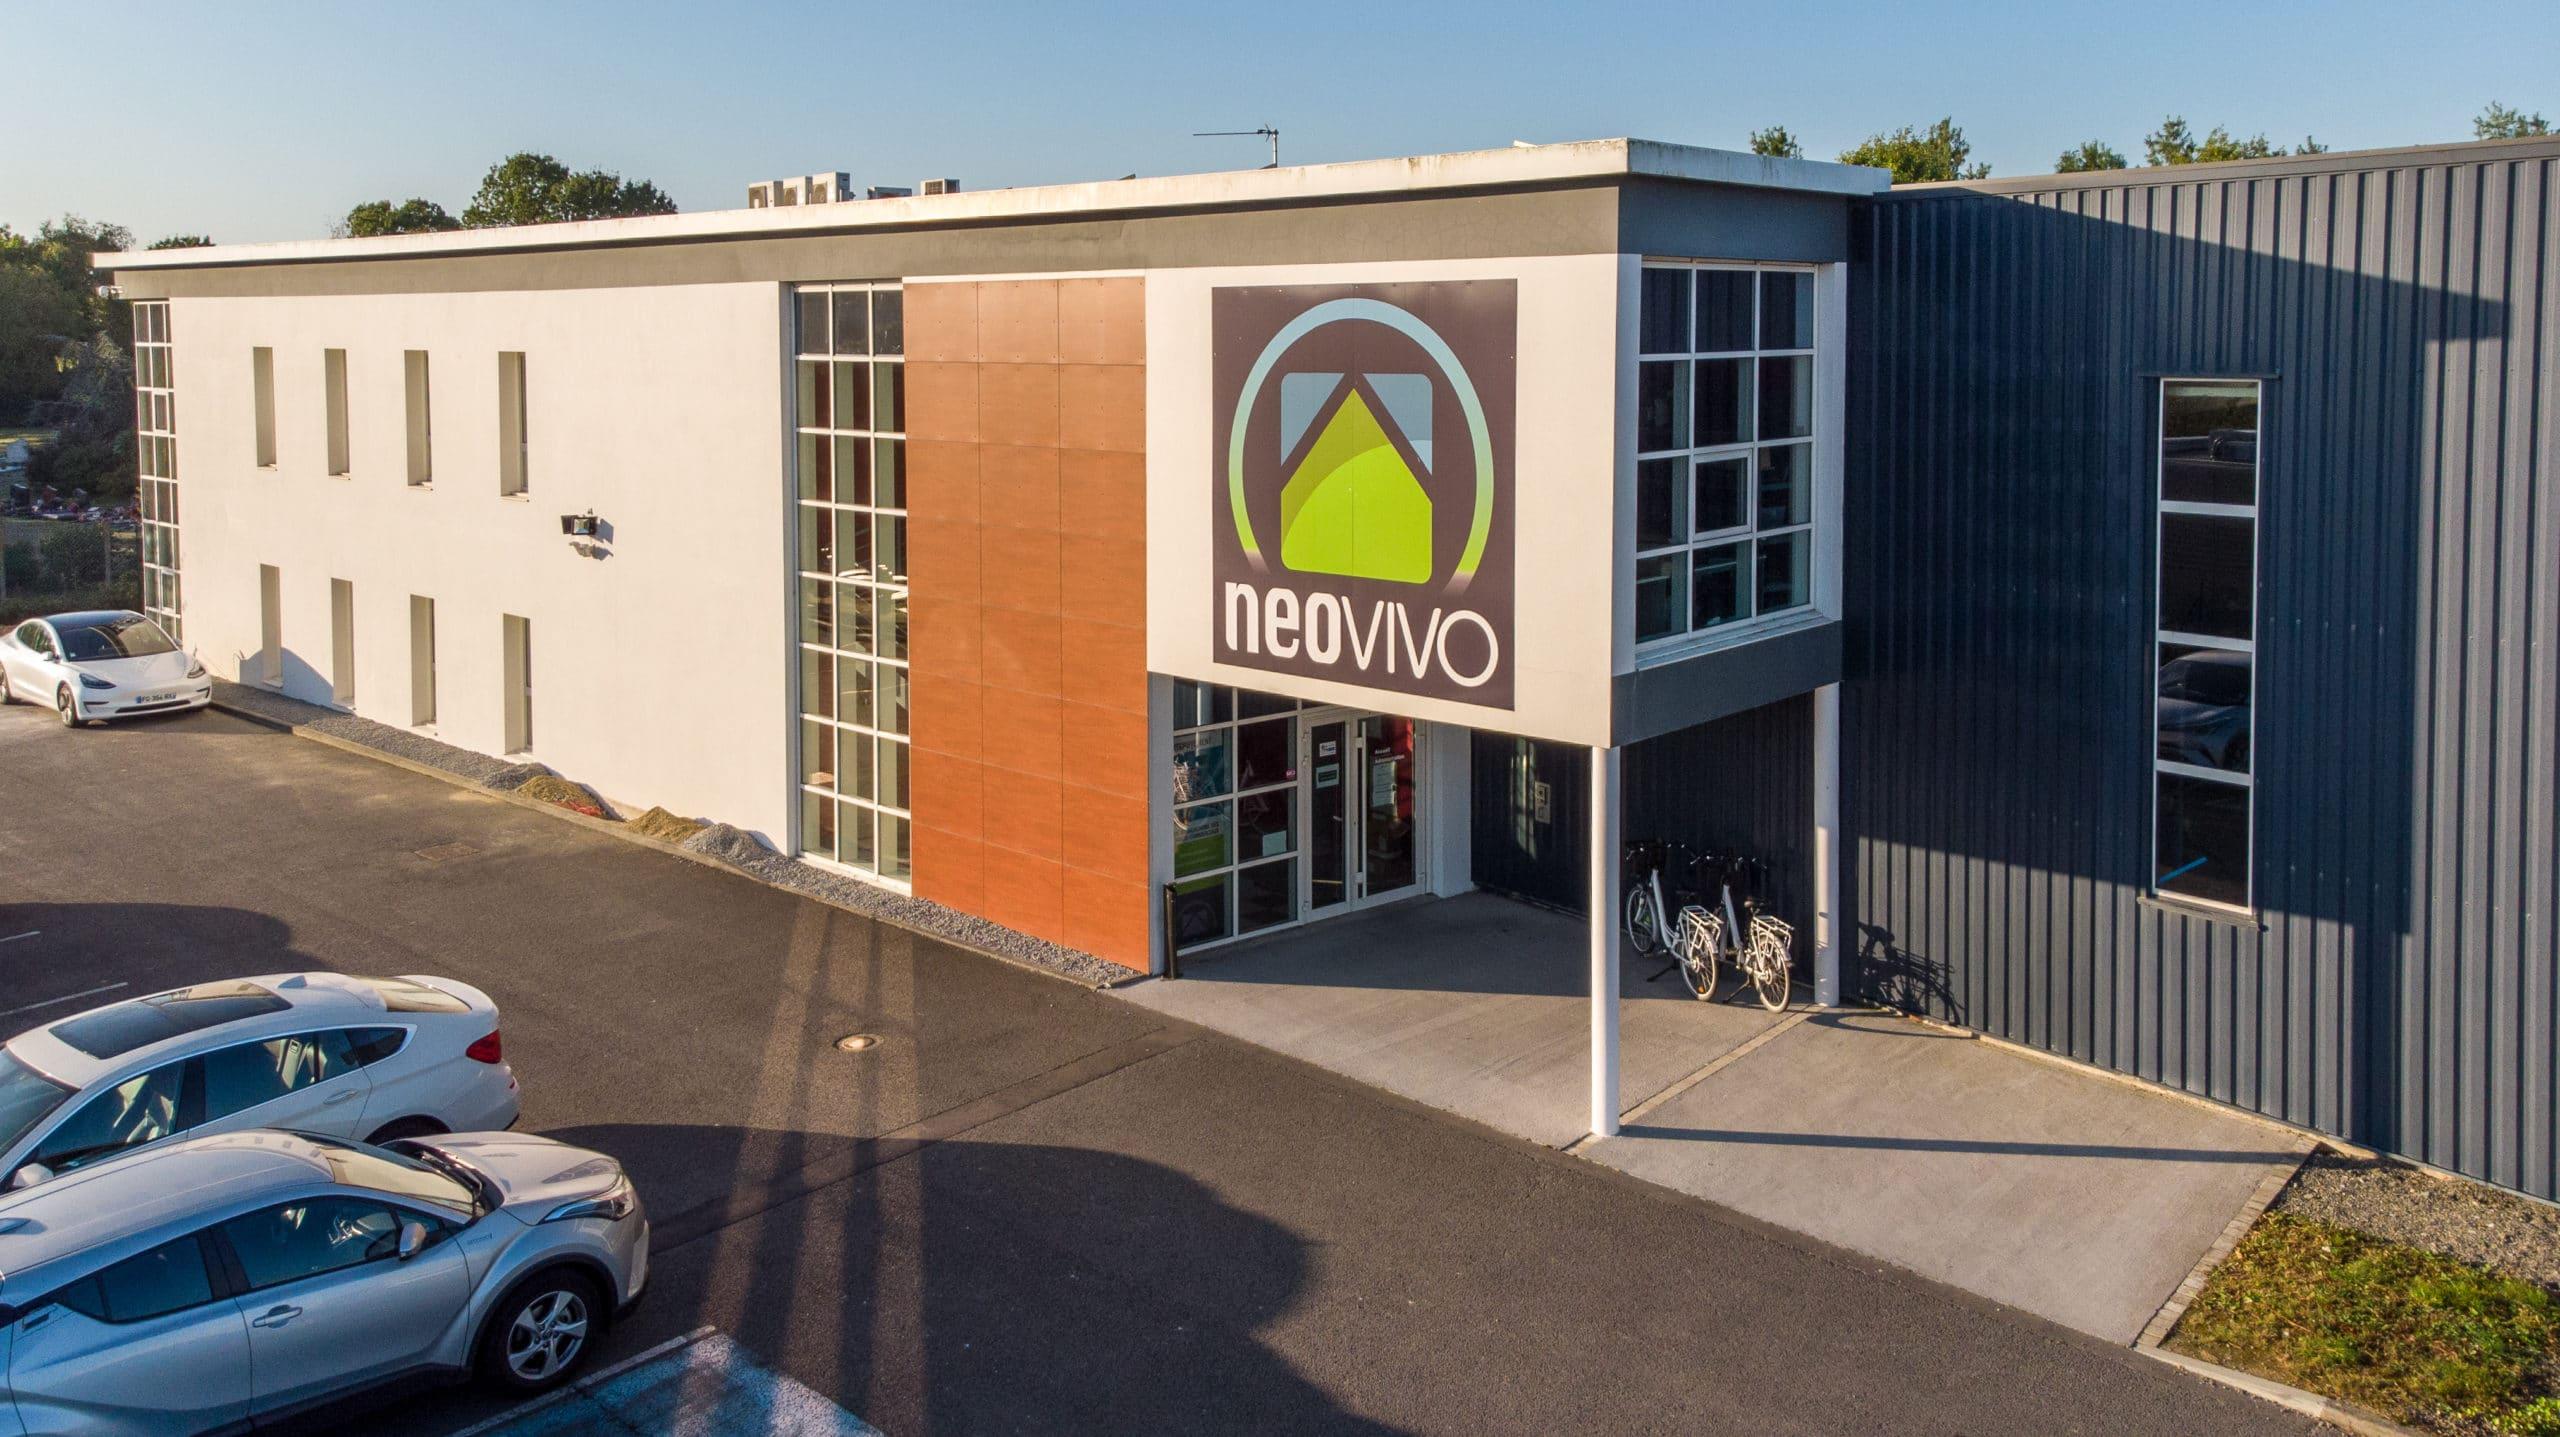 neovivo-vue-aerienne-agence-nantes